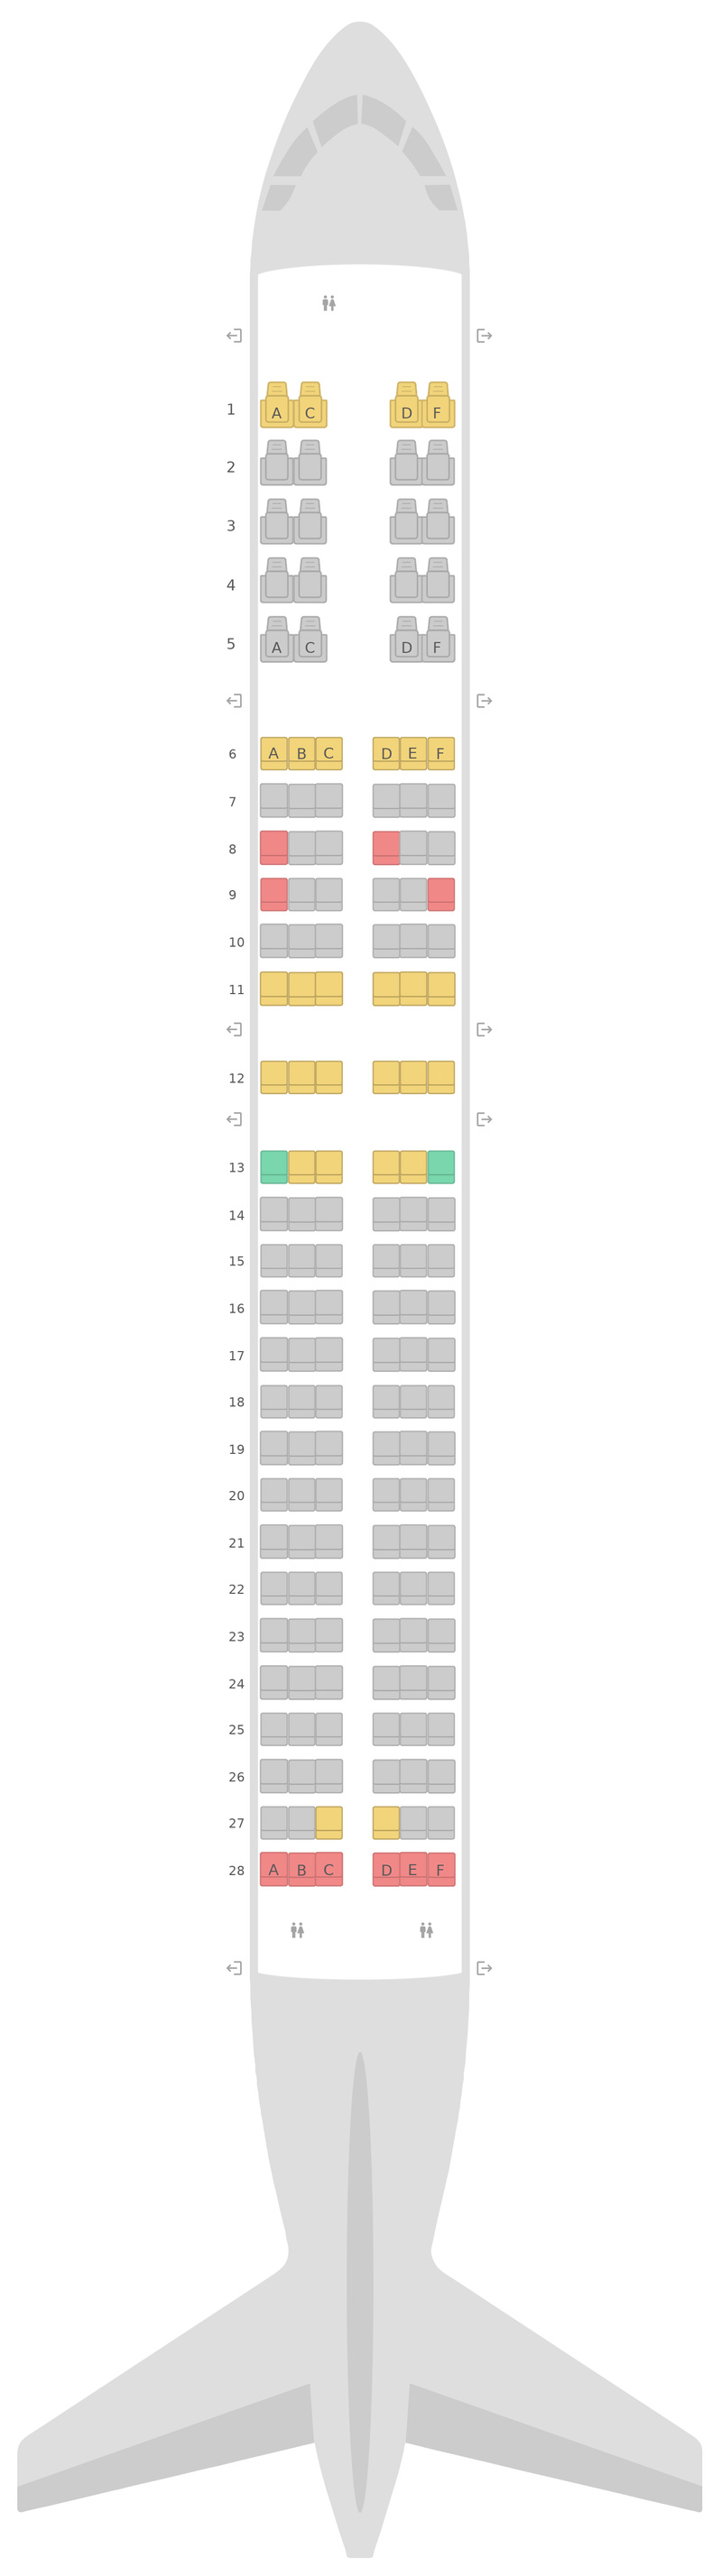 Mapa de asientos Boeing 737-800 (738) Aeroflot